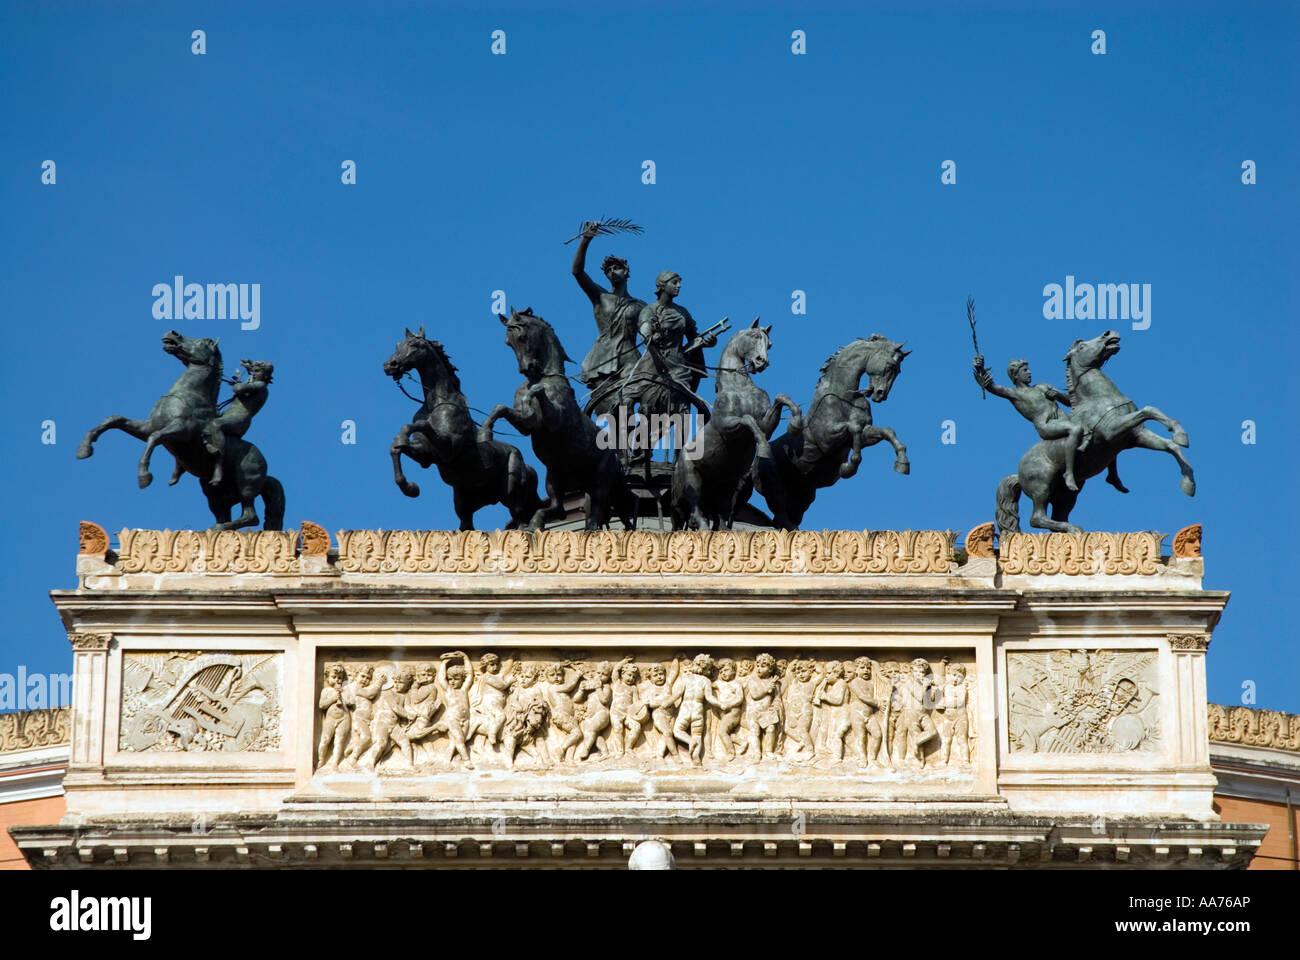 Bronze sculpture on the roof of the Teatro Politeama Garibaldi, Palermo, Sicily Italy Stock Photo